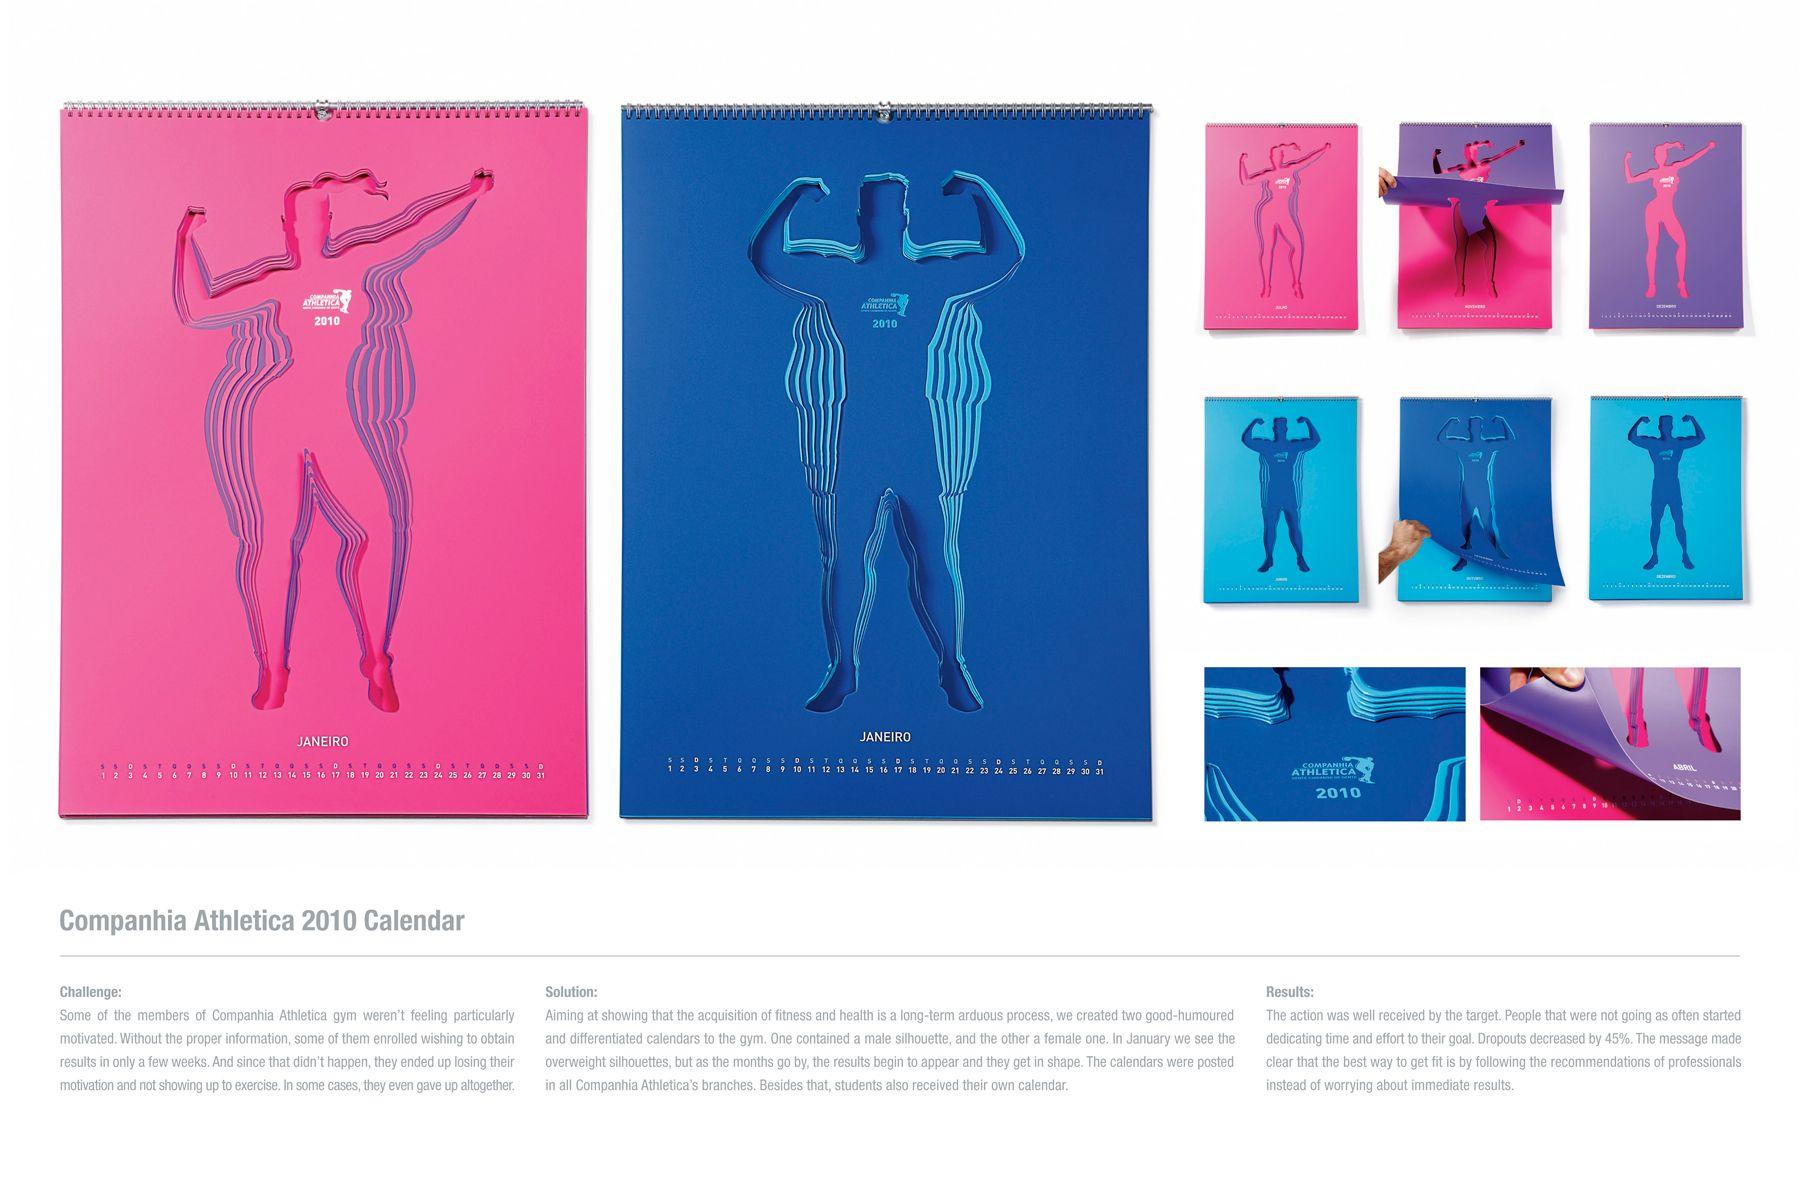 Calendar Typography Examples : Cia athletica gym calendar print image creativity online